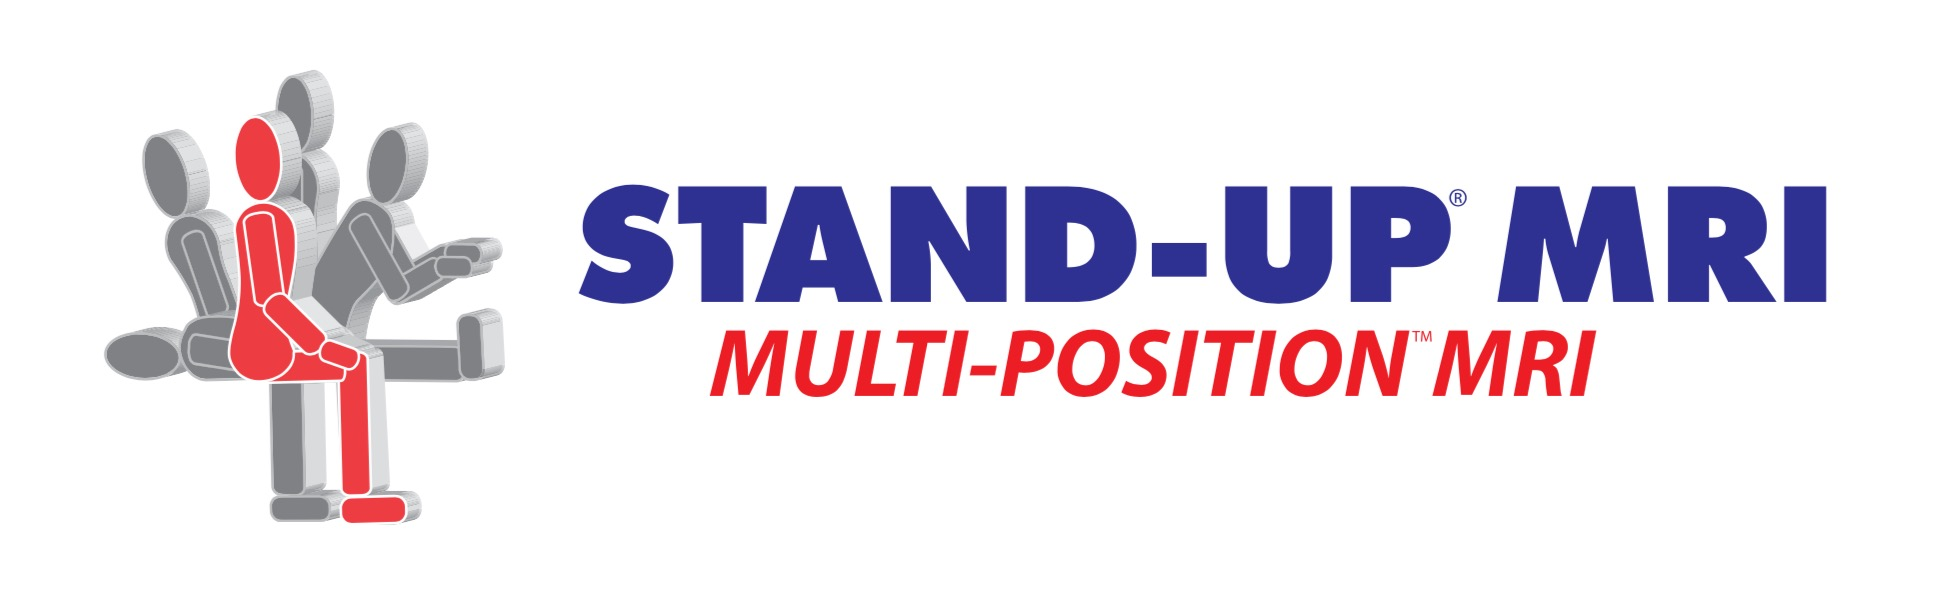 Stand Up MRI